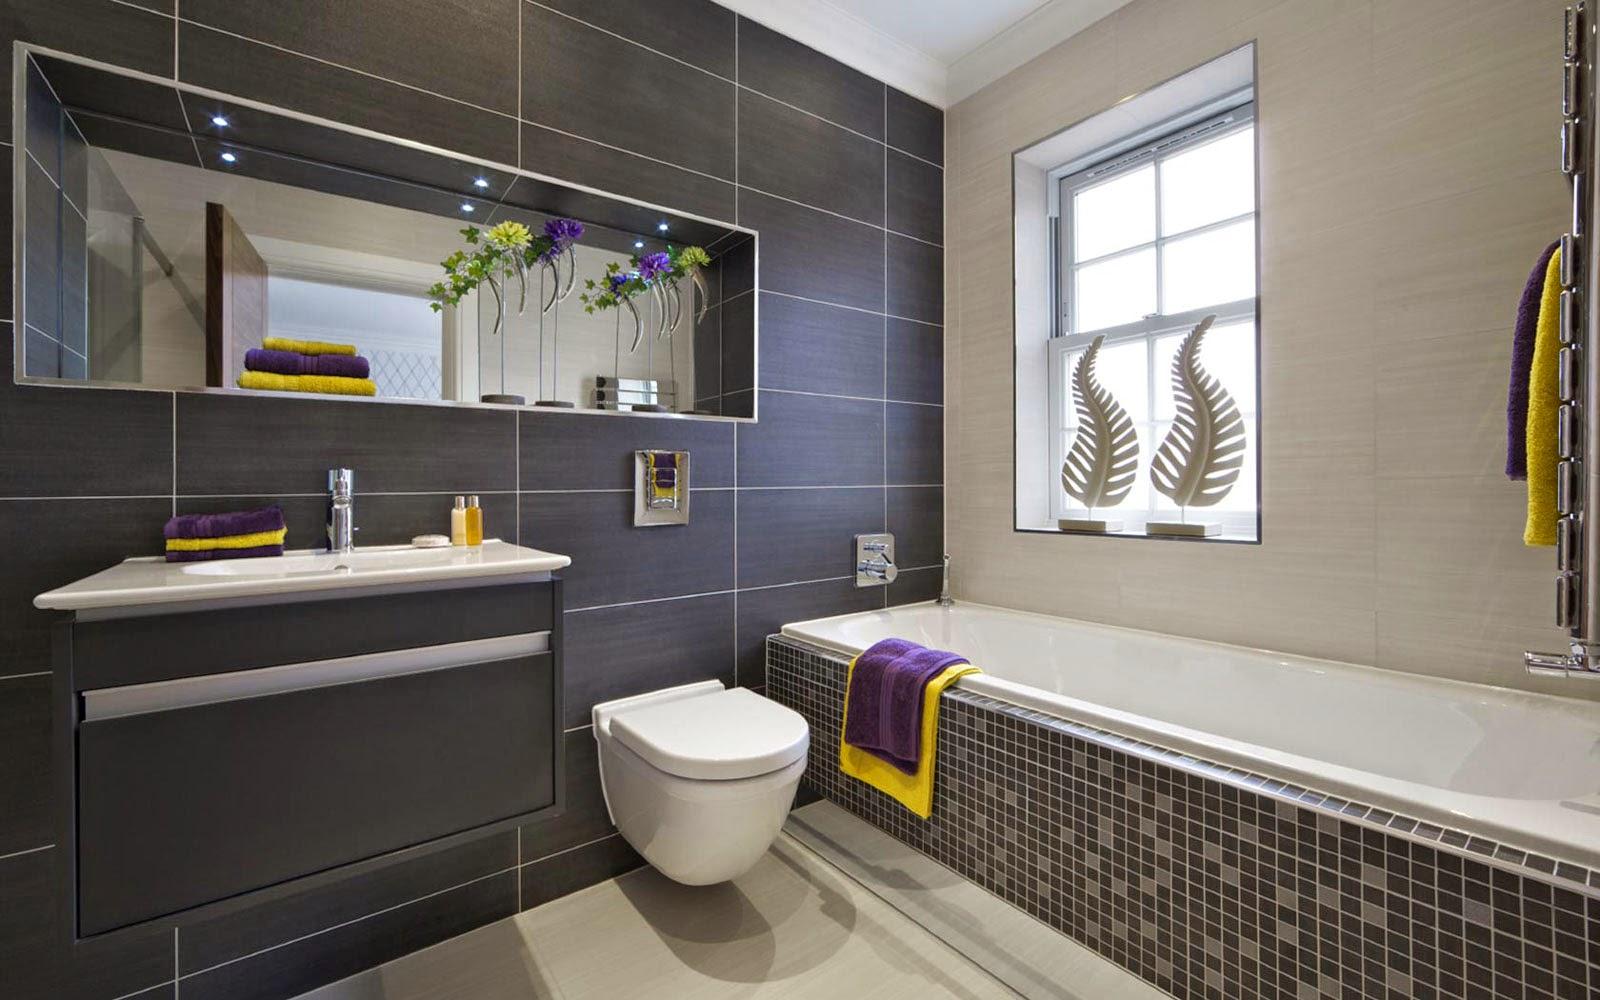 Design-Space-Rooms Bath